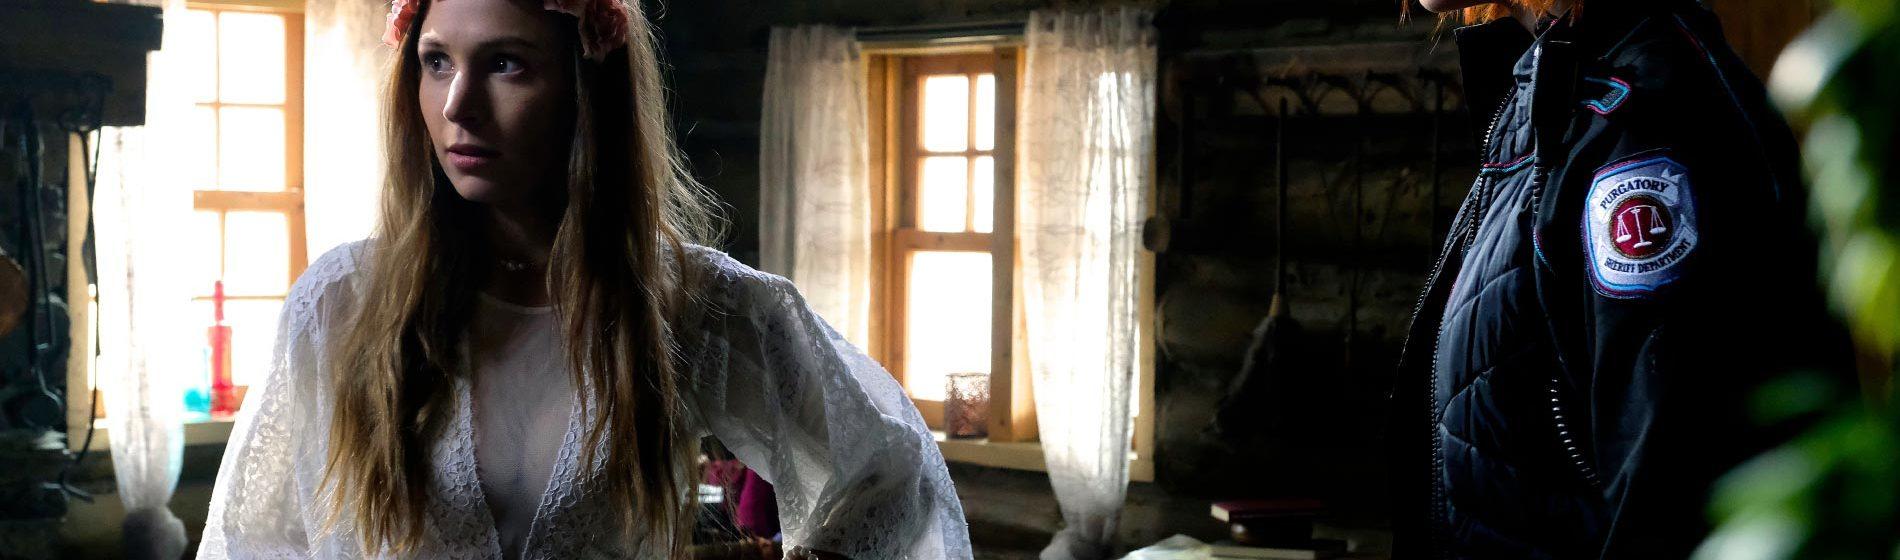 Wynonna Earp Season 2 Episode 11